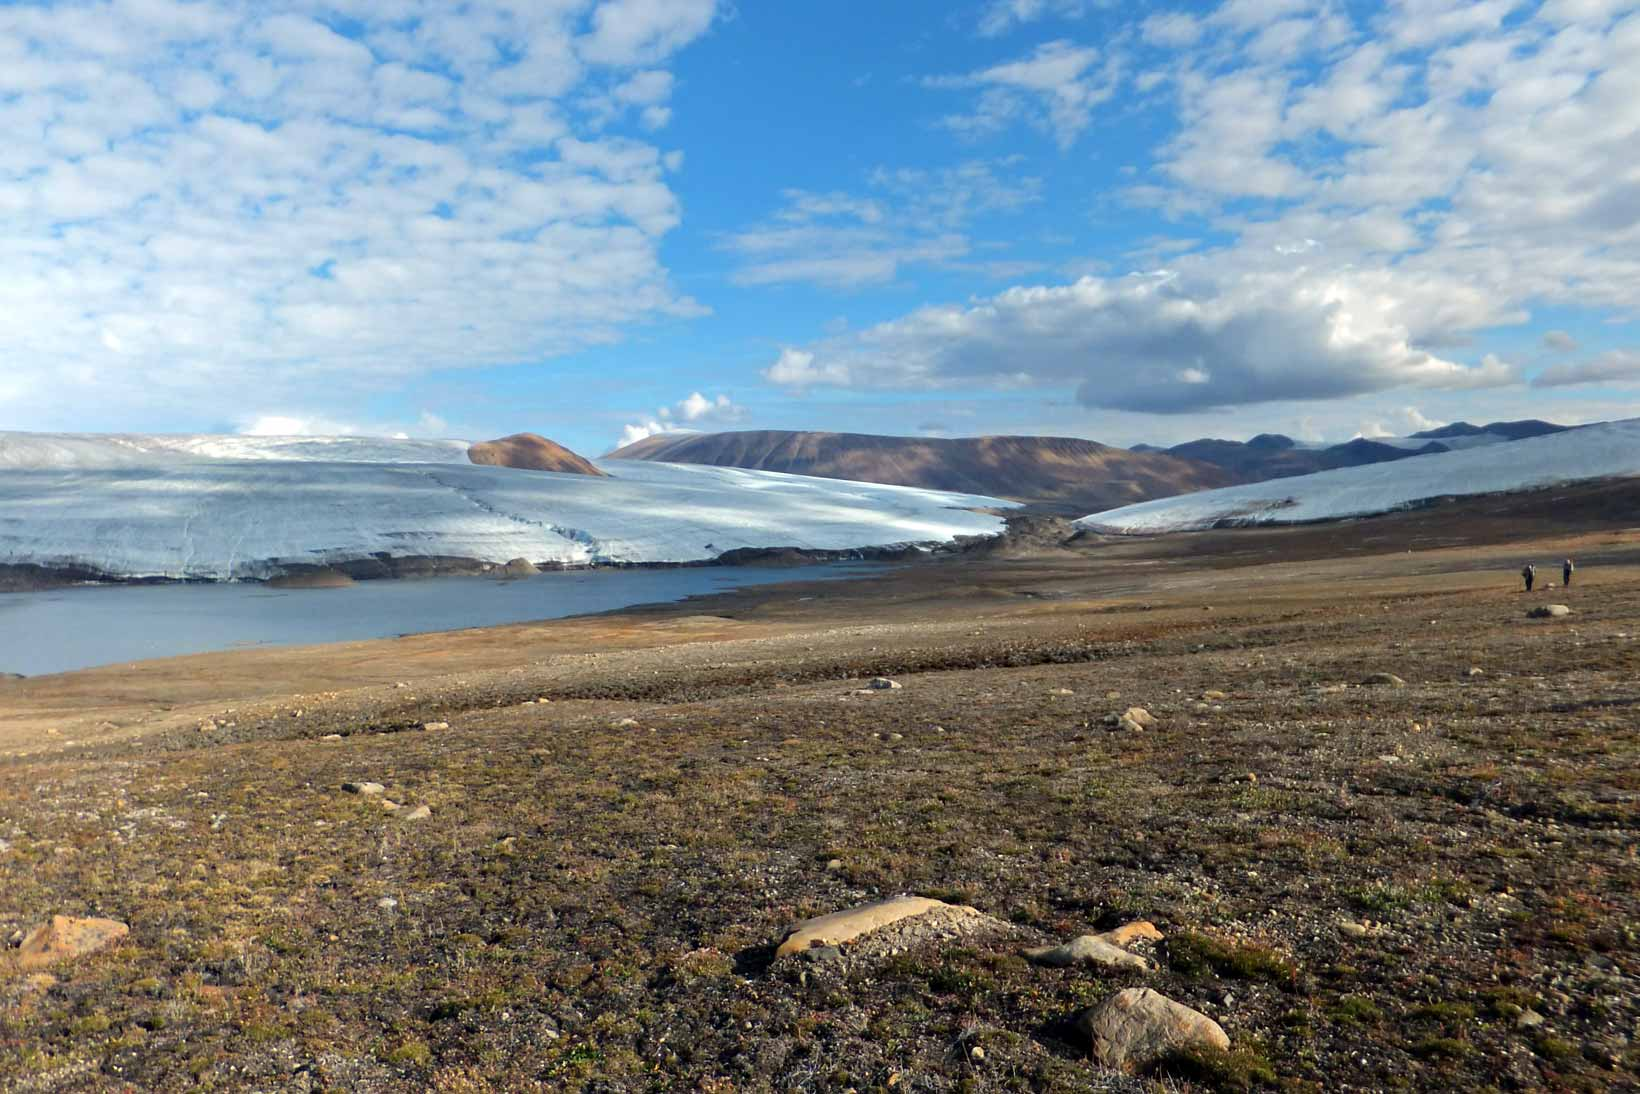 Junction of Scylla and Charybdis glaciers, Quttinirpaaq National Park, Nunavut, Canada.